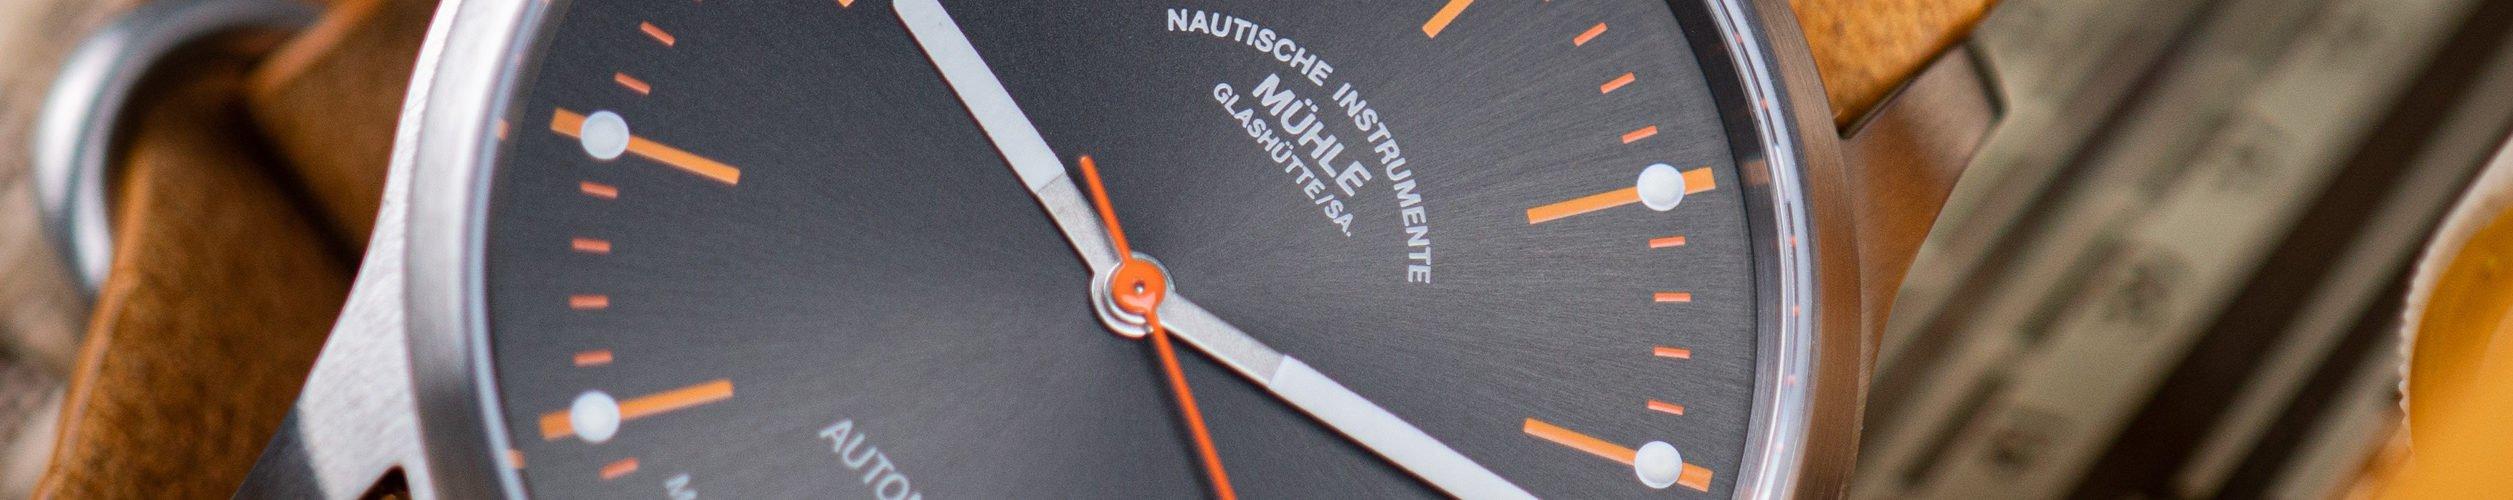 Mühle-Glashütte Panova Grau Test Preis Head